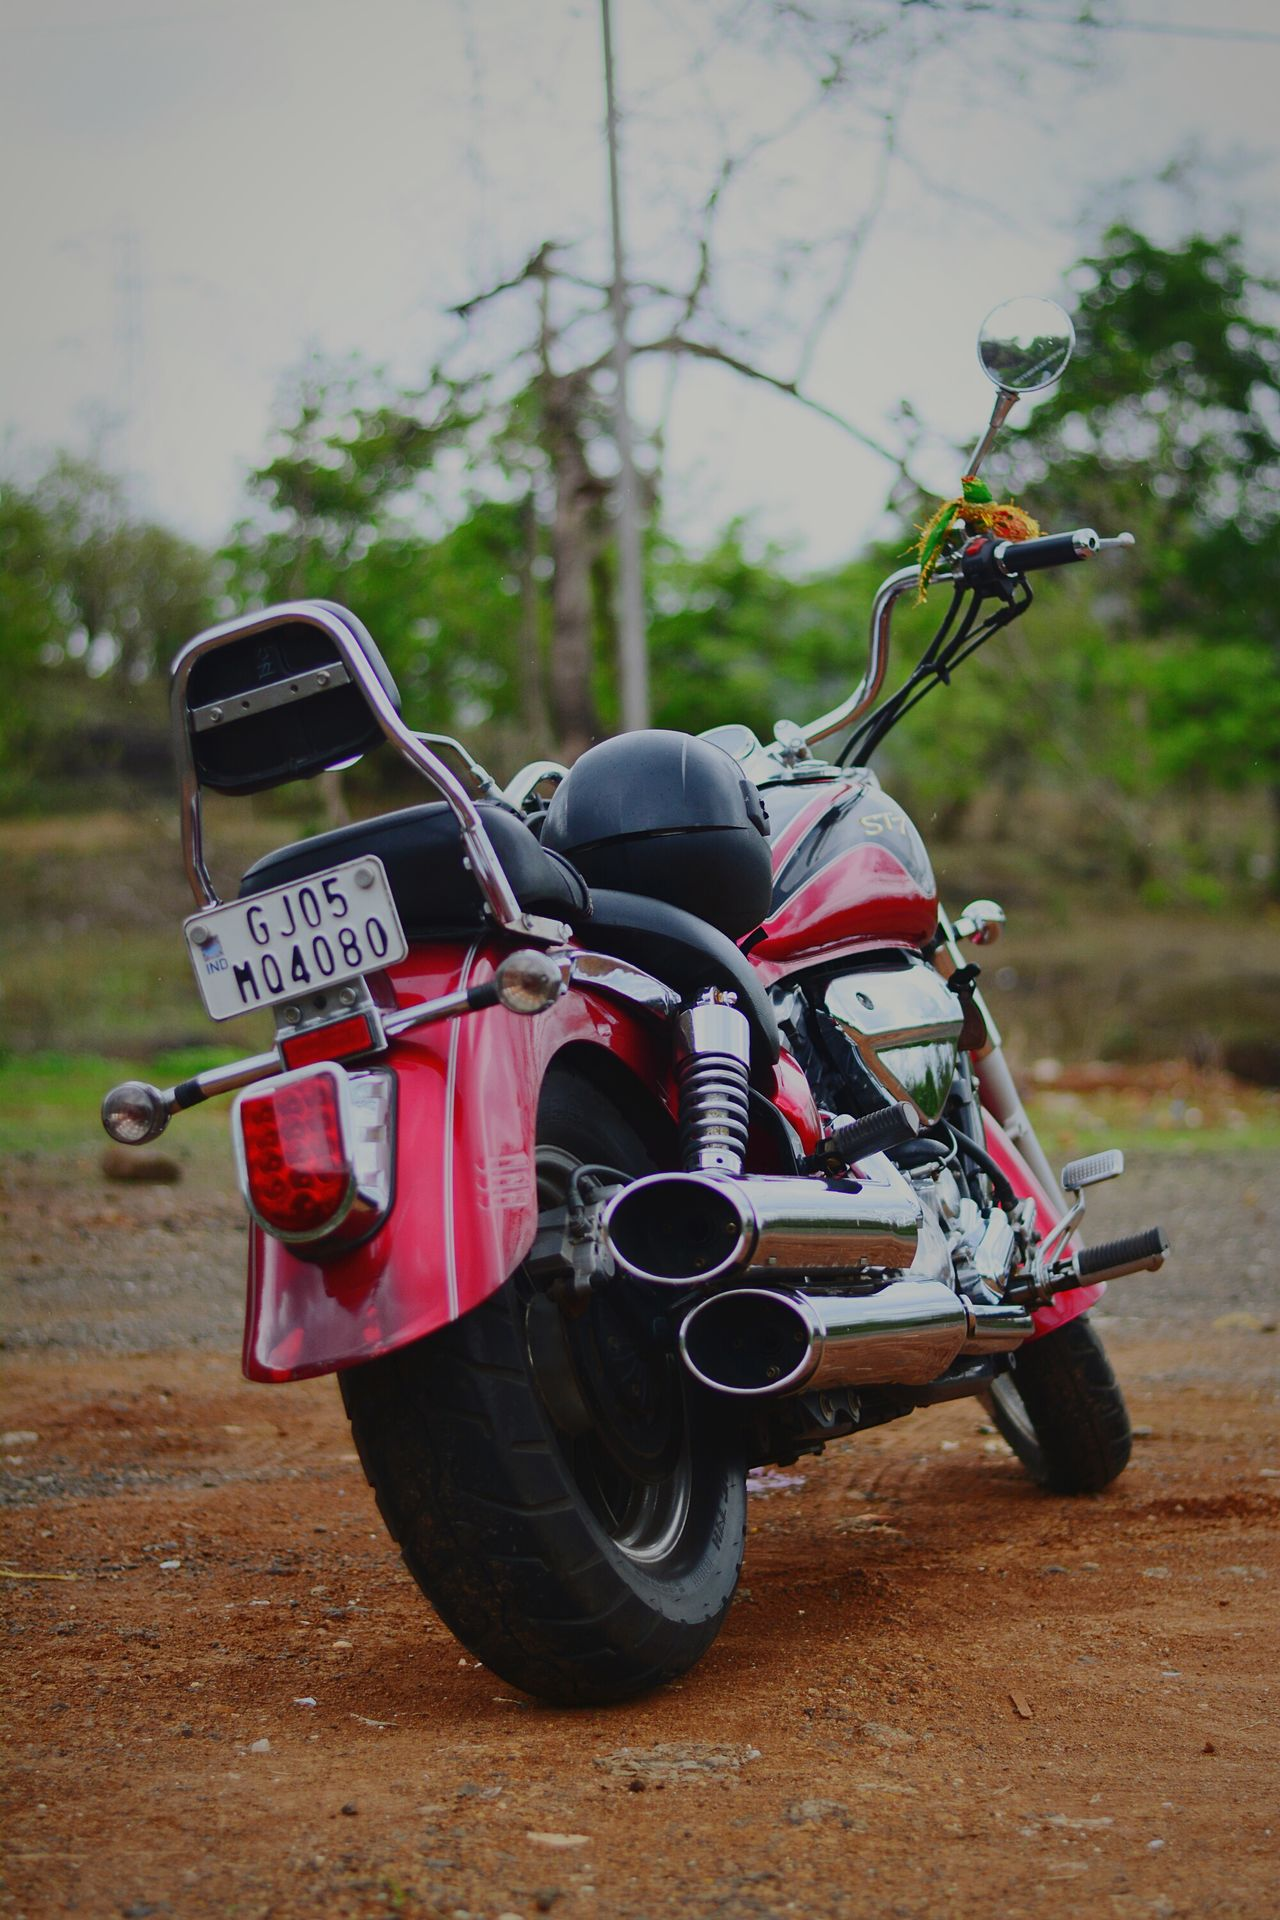 BRING ME ON ROAD.WAITING FOR U! Motorcycle Outdoors No People Green Green Green!  Hyosung HYOSUNG_GTR_😍😍 Cruiser Cruiserbike Redbeast Lovetoride Potrait Readyforride Soulful